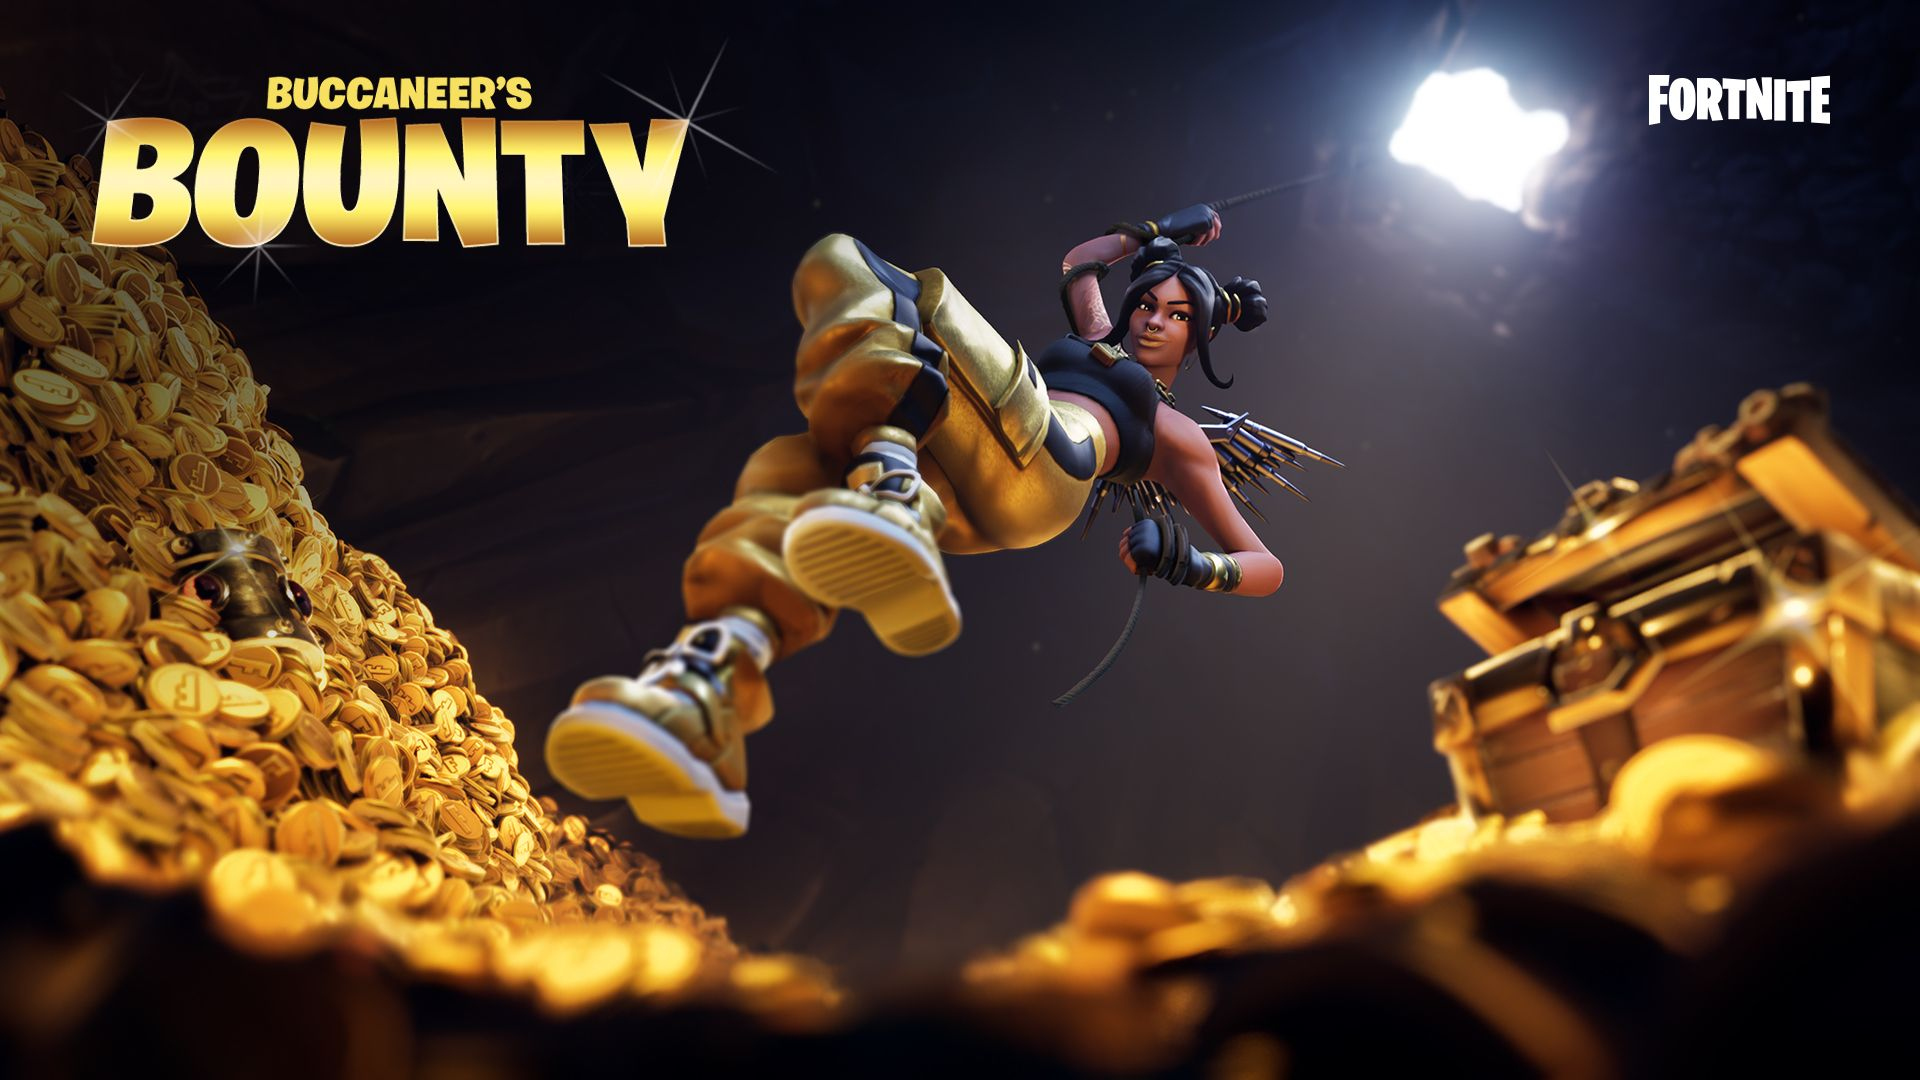 Fortnite Stuck On Loading Screen Mac fortnite' update 8.30 adds reboot van & buccaneer's bounty